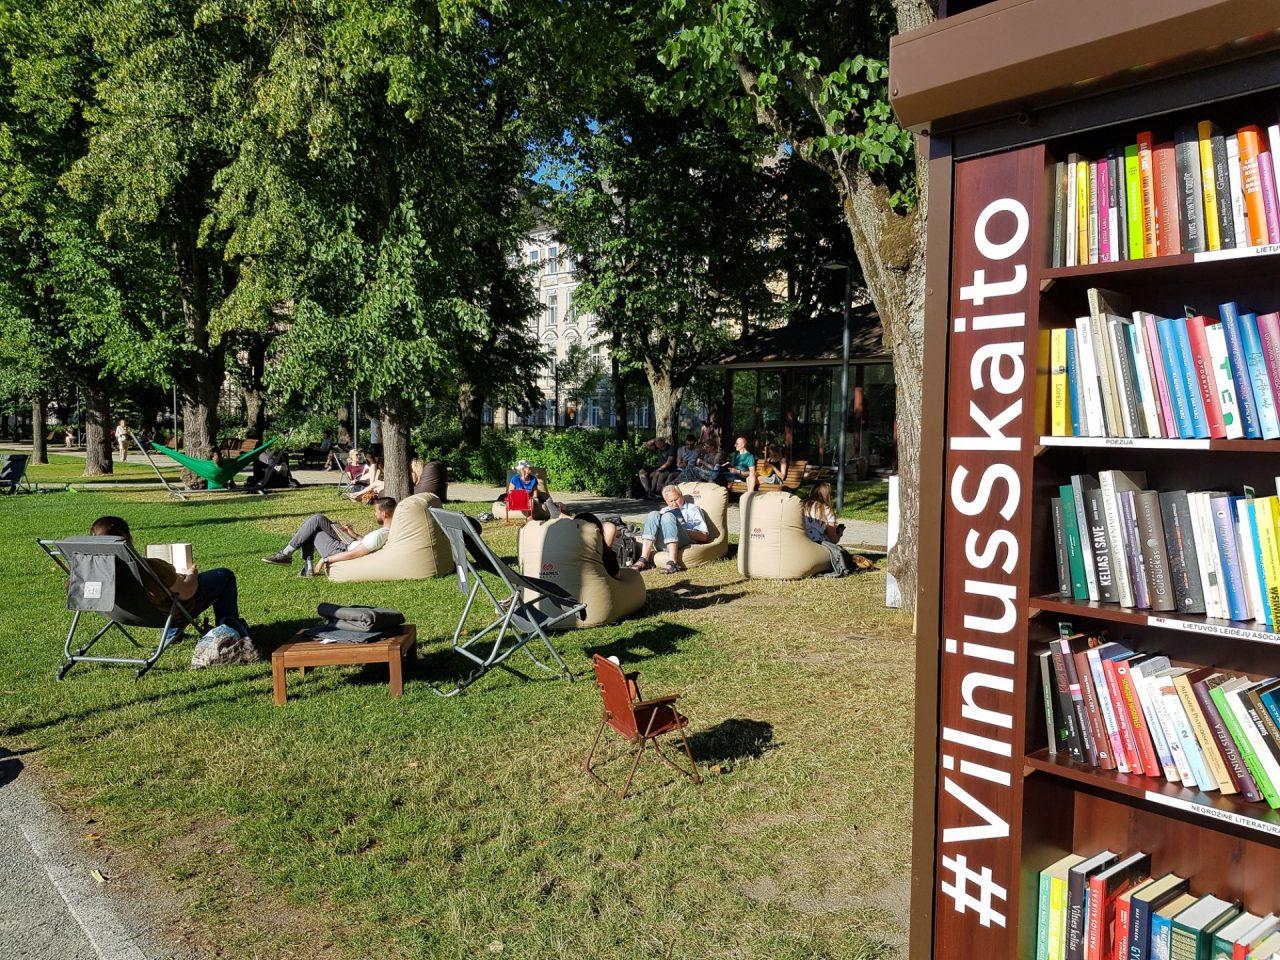 lituanie-vilnius-parc-lukiskes-bibliotheque-plein-air-gratuite